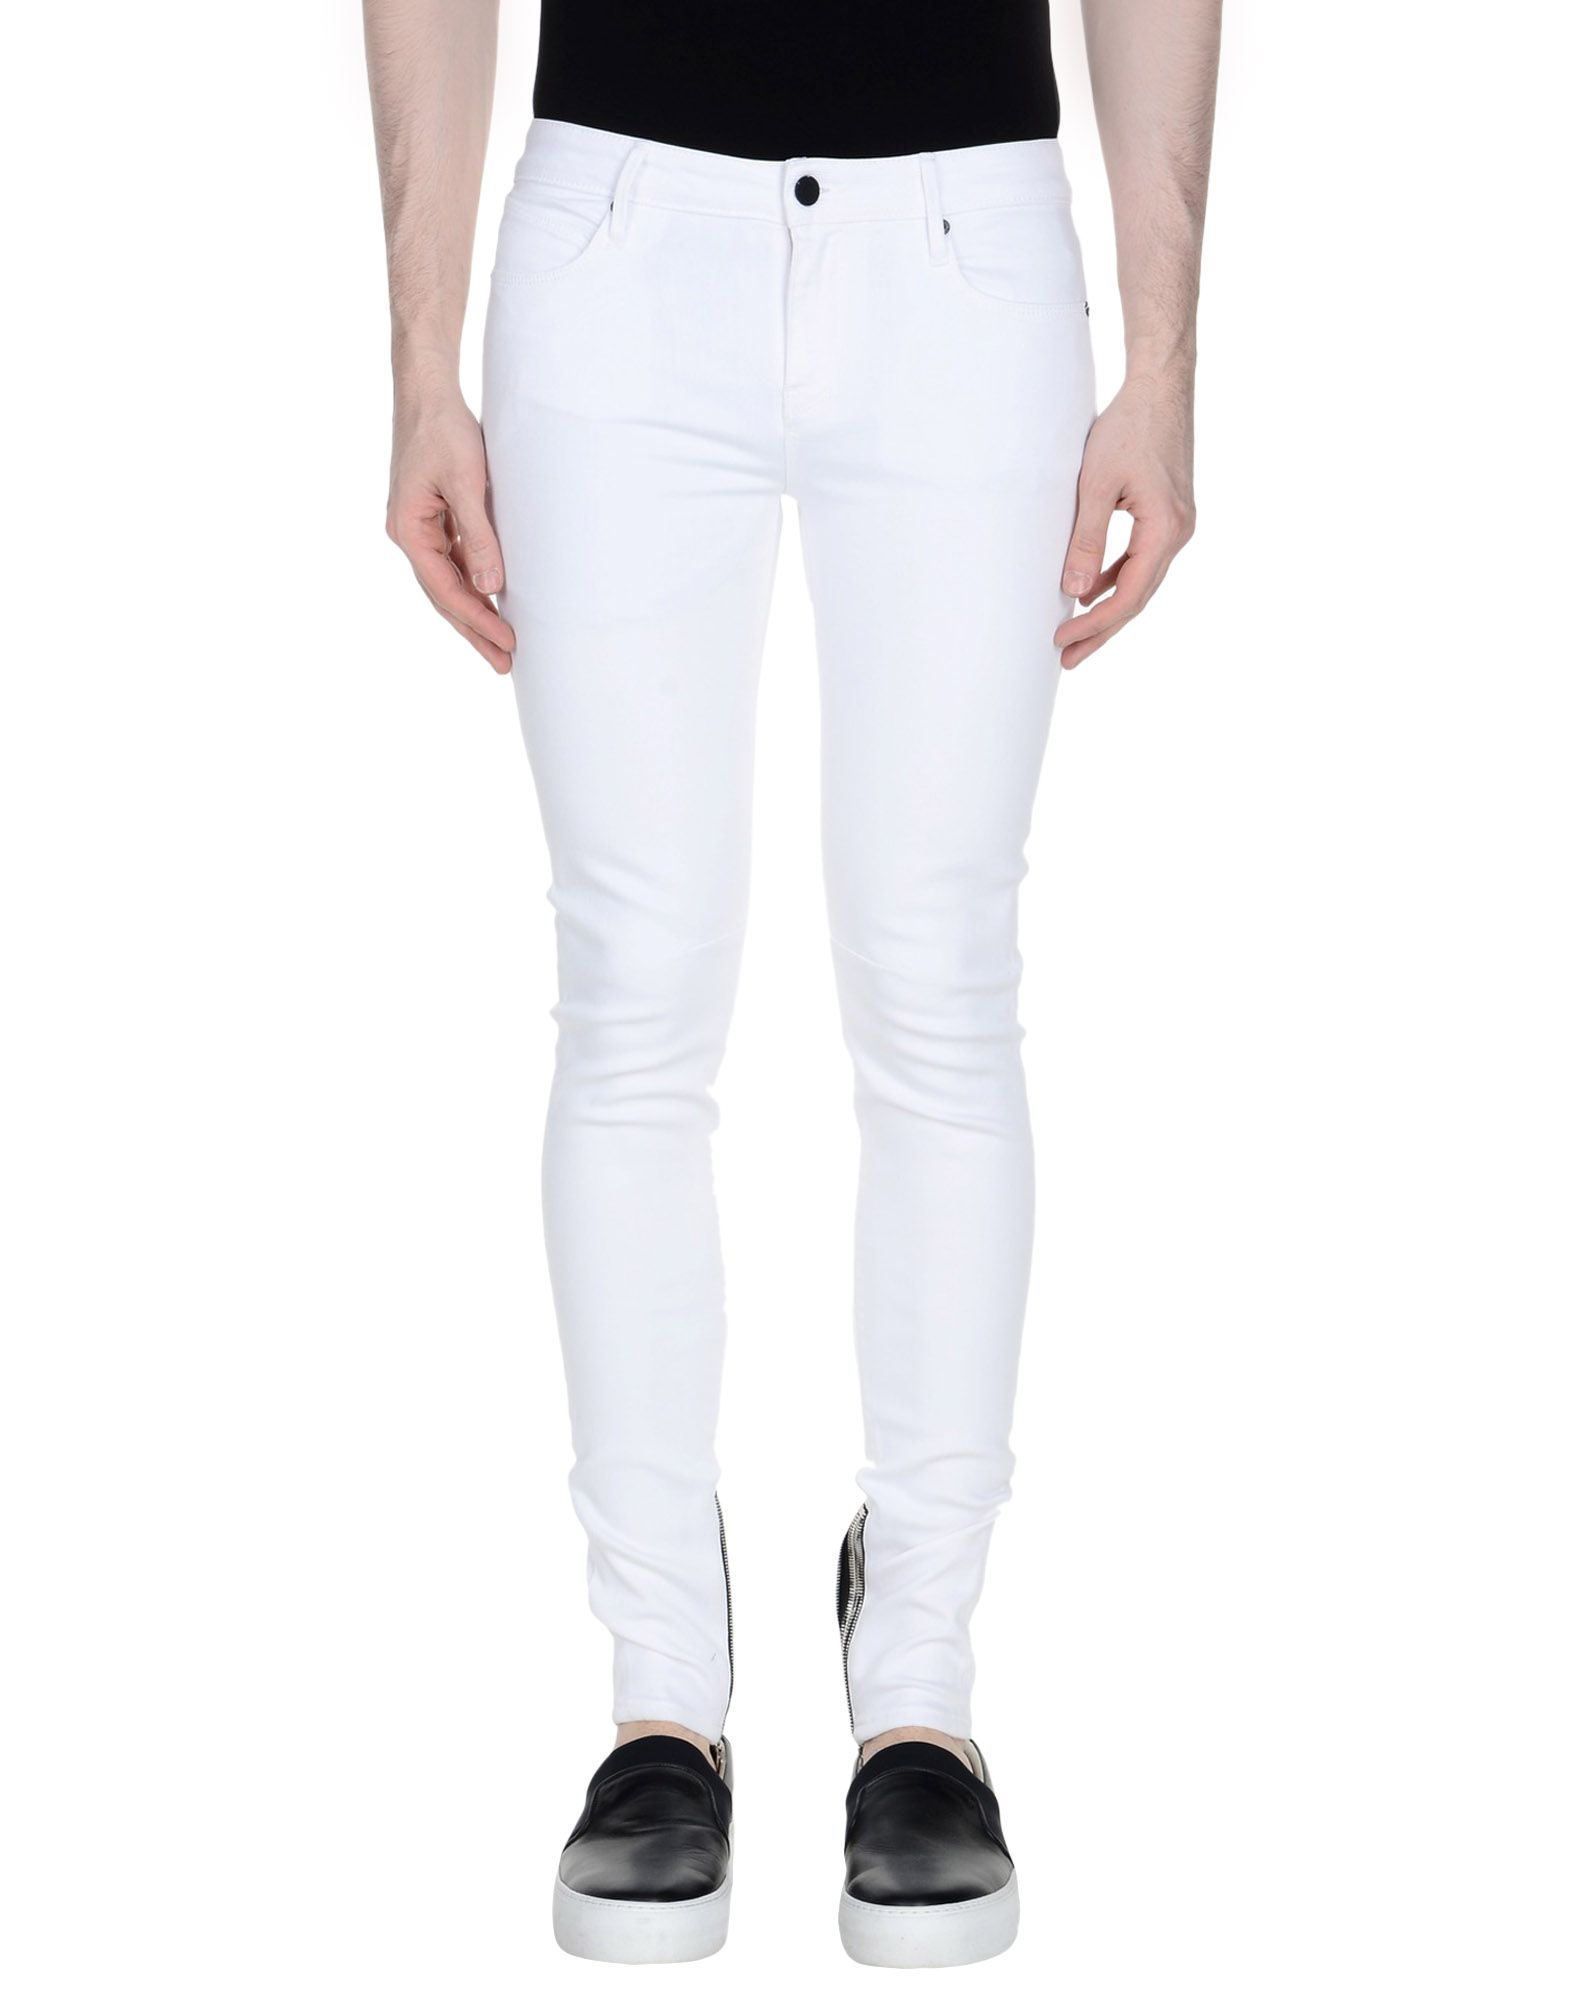 Pantaloni Jeans Rta Uomo - Acquista online su